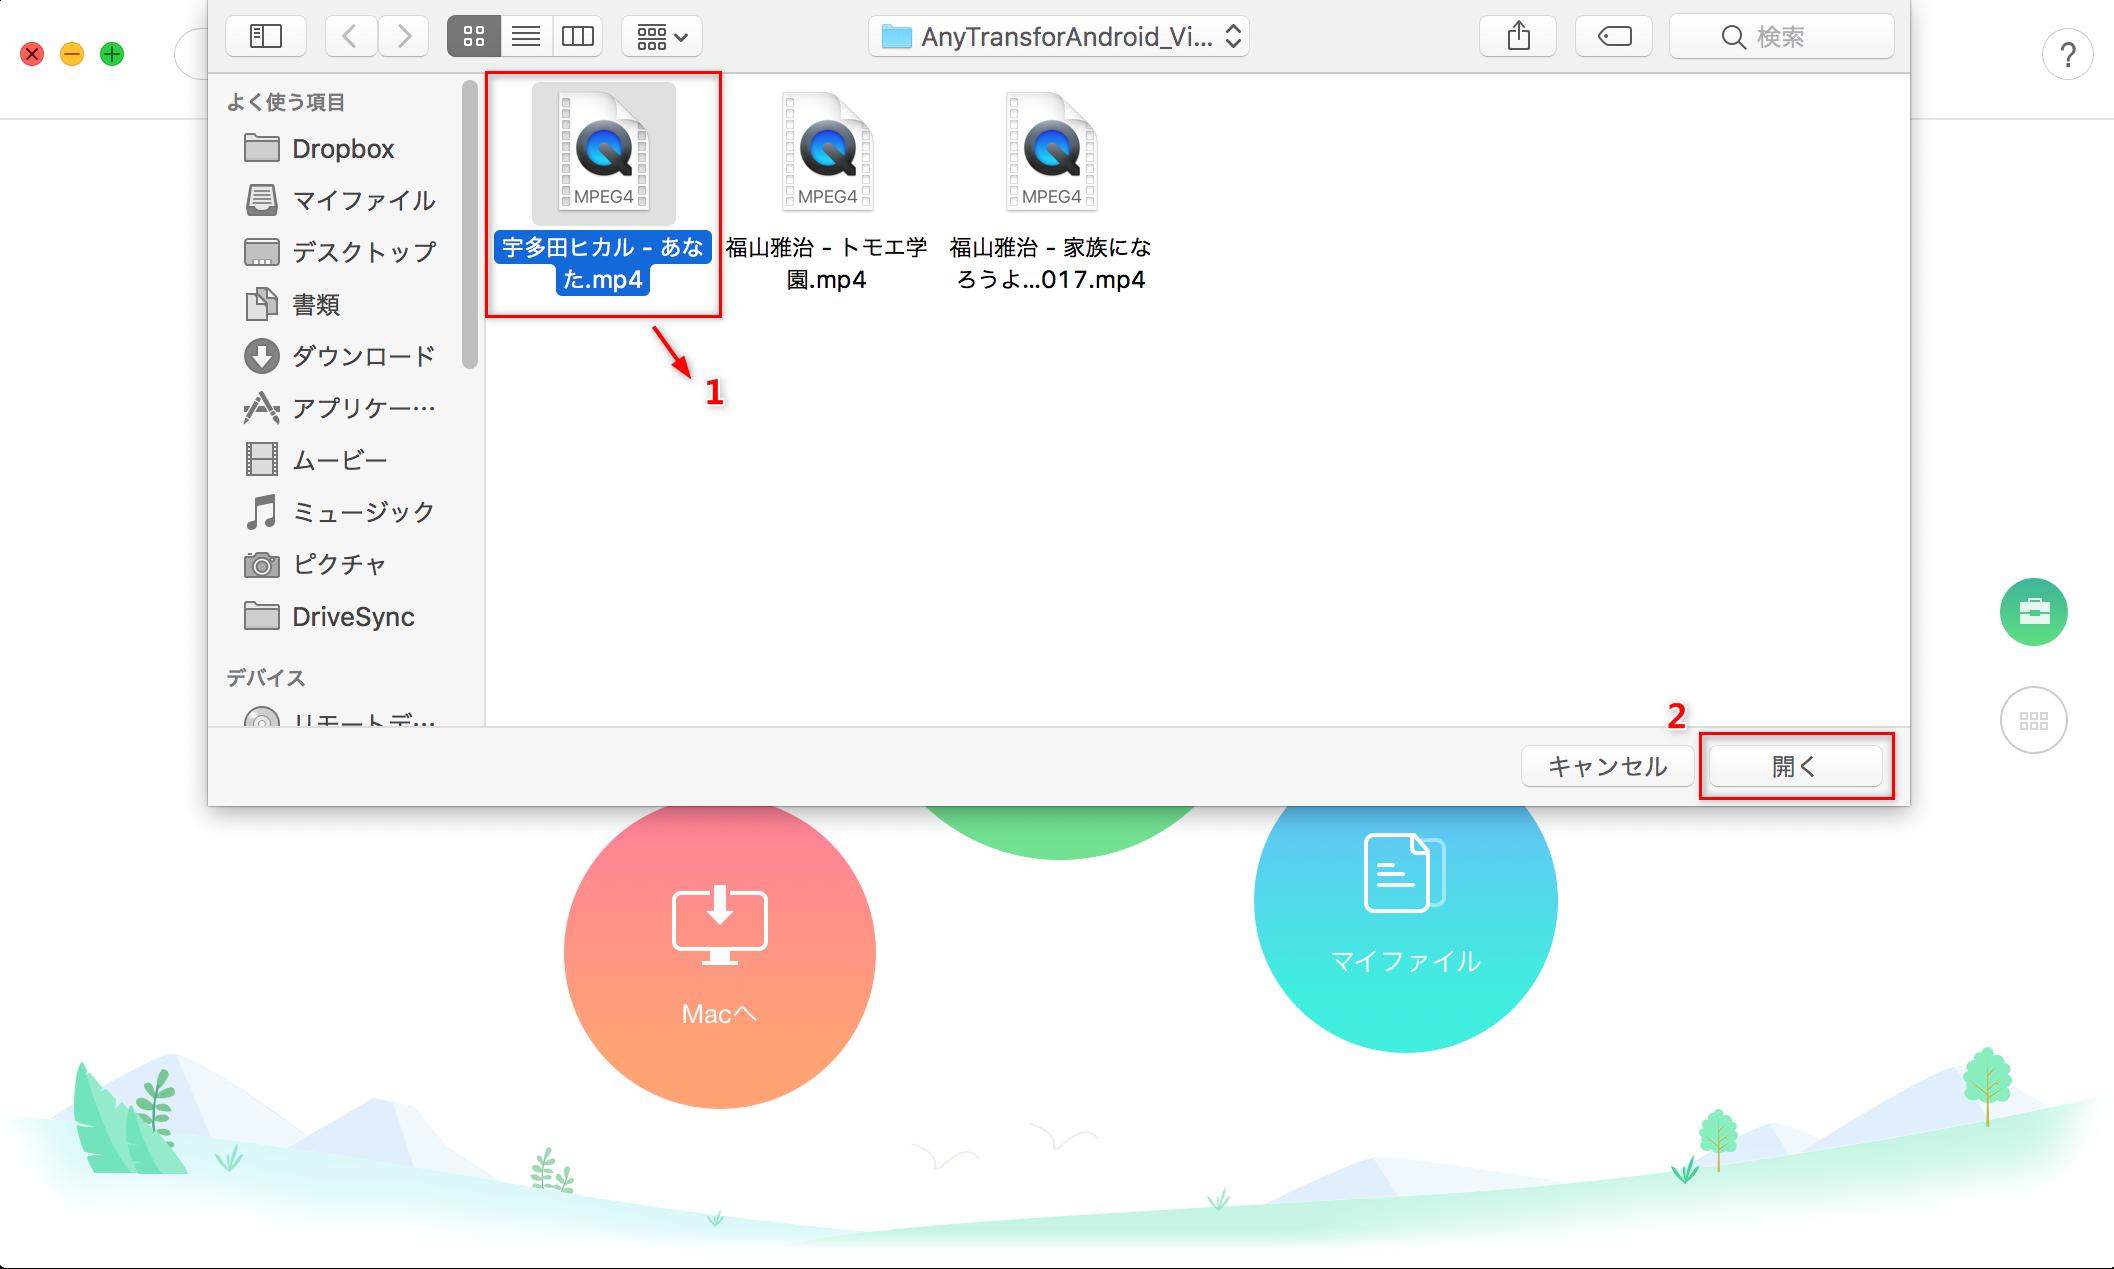 MacとAndroid間でデータを同期する簡単な方法